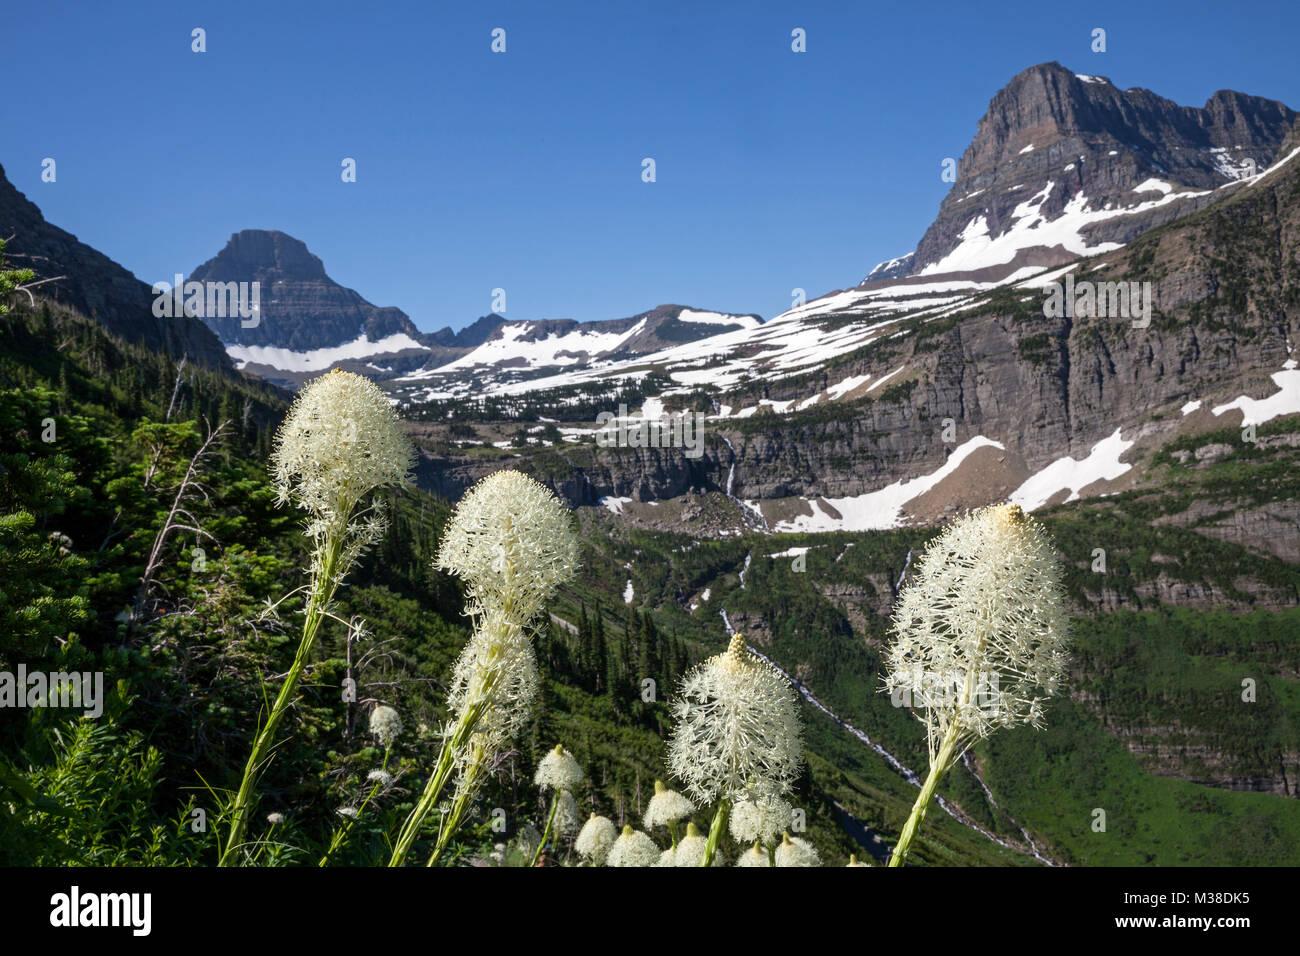 MT00103-00...WASHINGTON - Beargrass blooming along the Garden Wall Trail in Waterton/Glacier International Peace - Stock Image